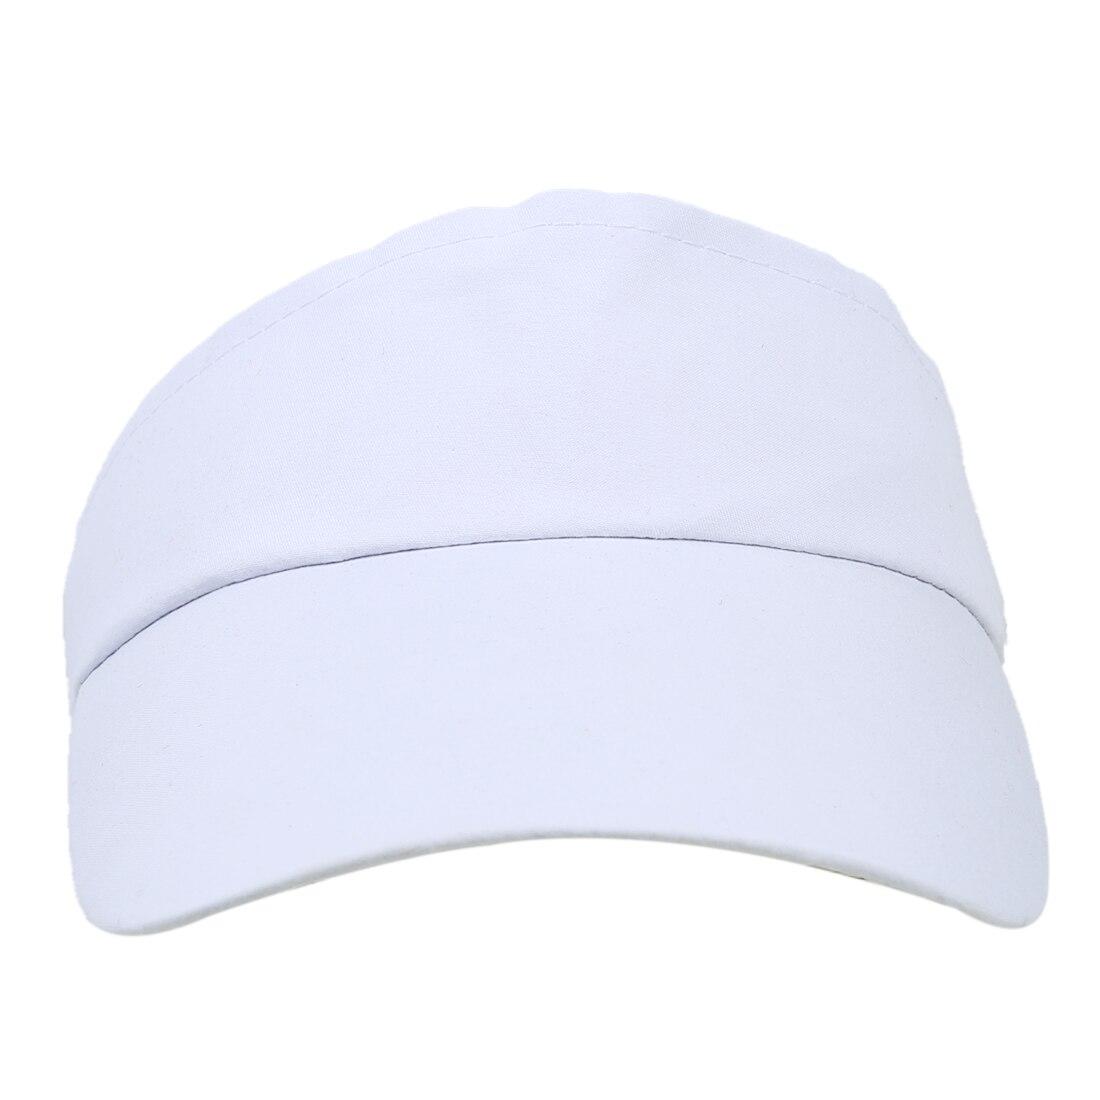 White Sun Sports Visor Hat Cap Tennis Golf Sweatband Headband UV  Protection-in Sun Hats from Apparel Accessories on Aliexpress.com  b27c625df90f